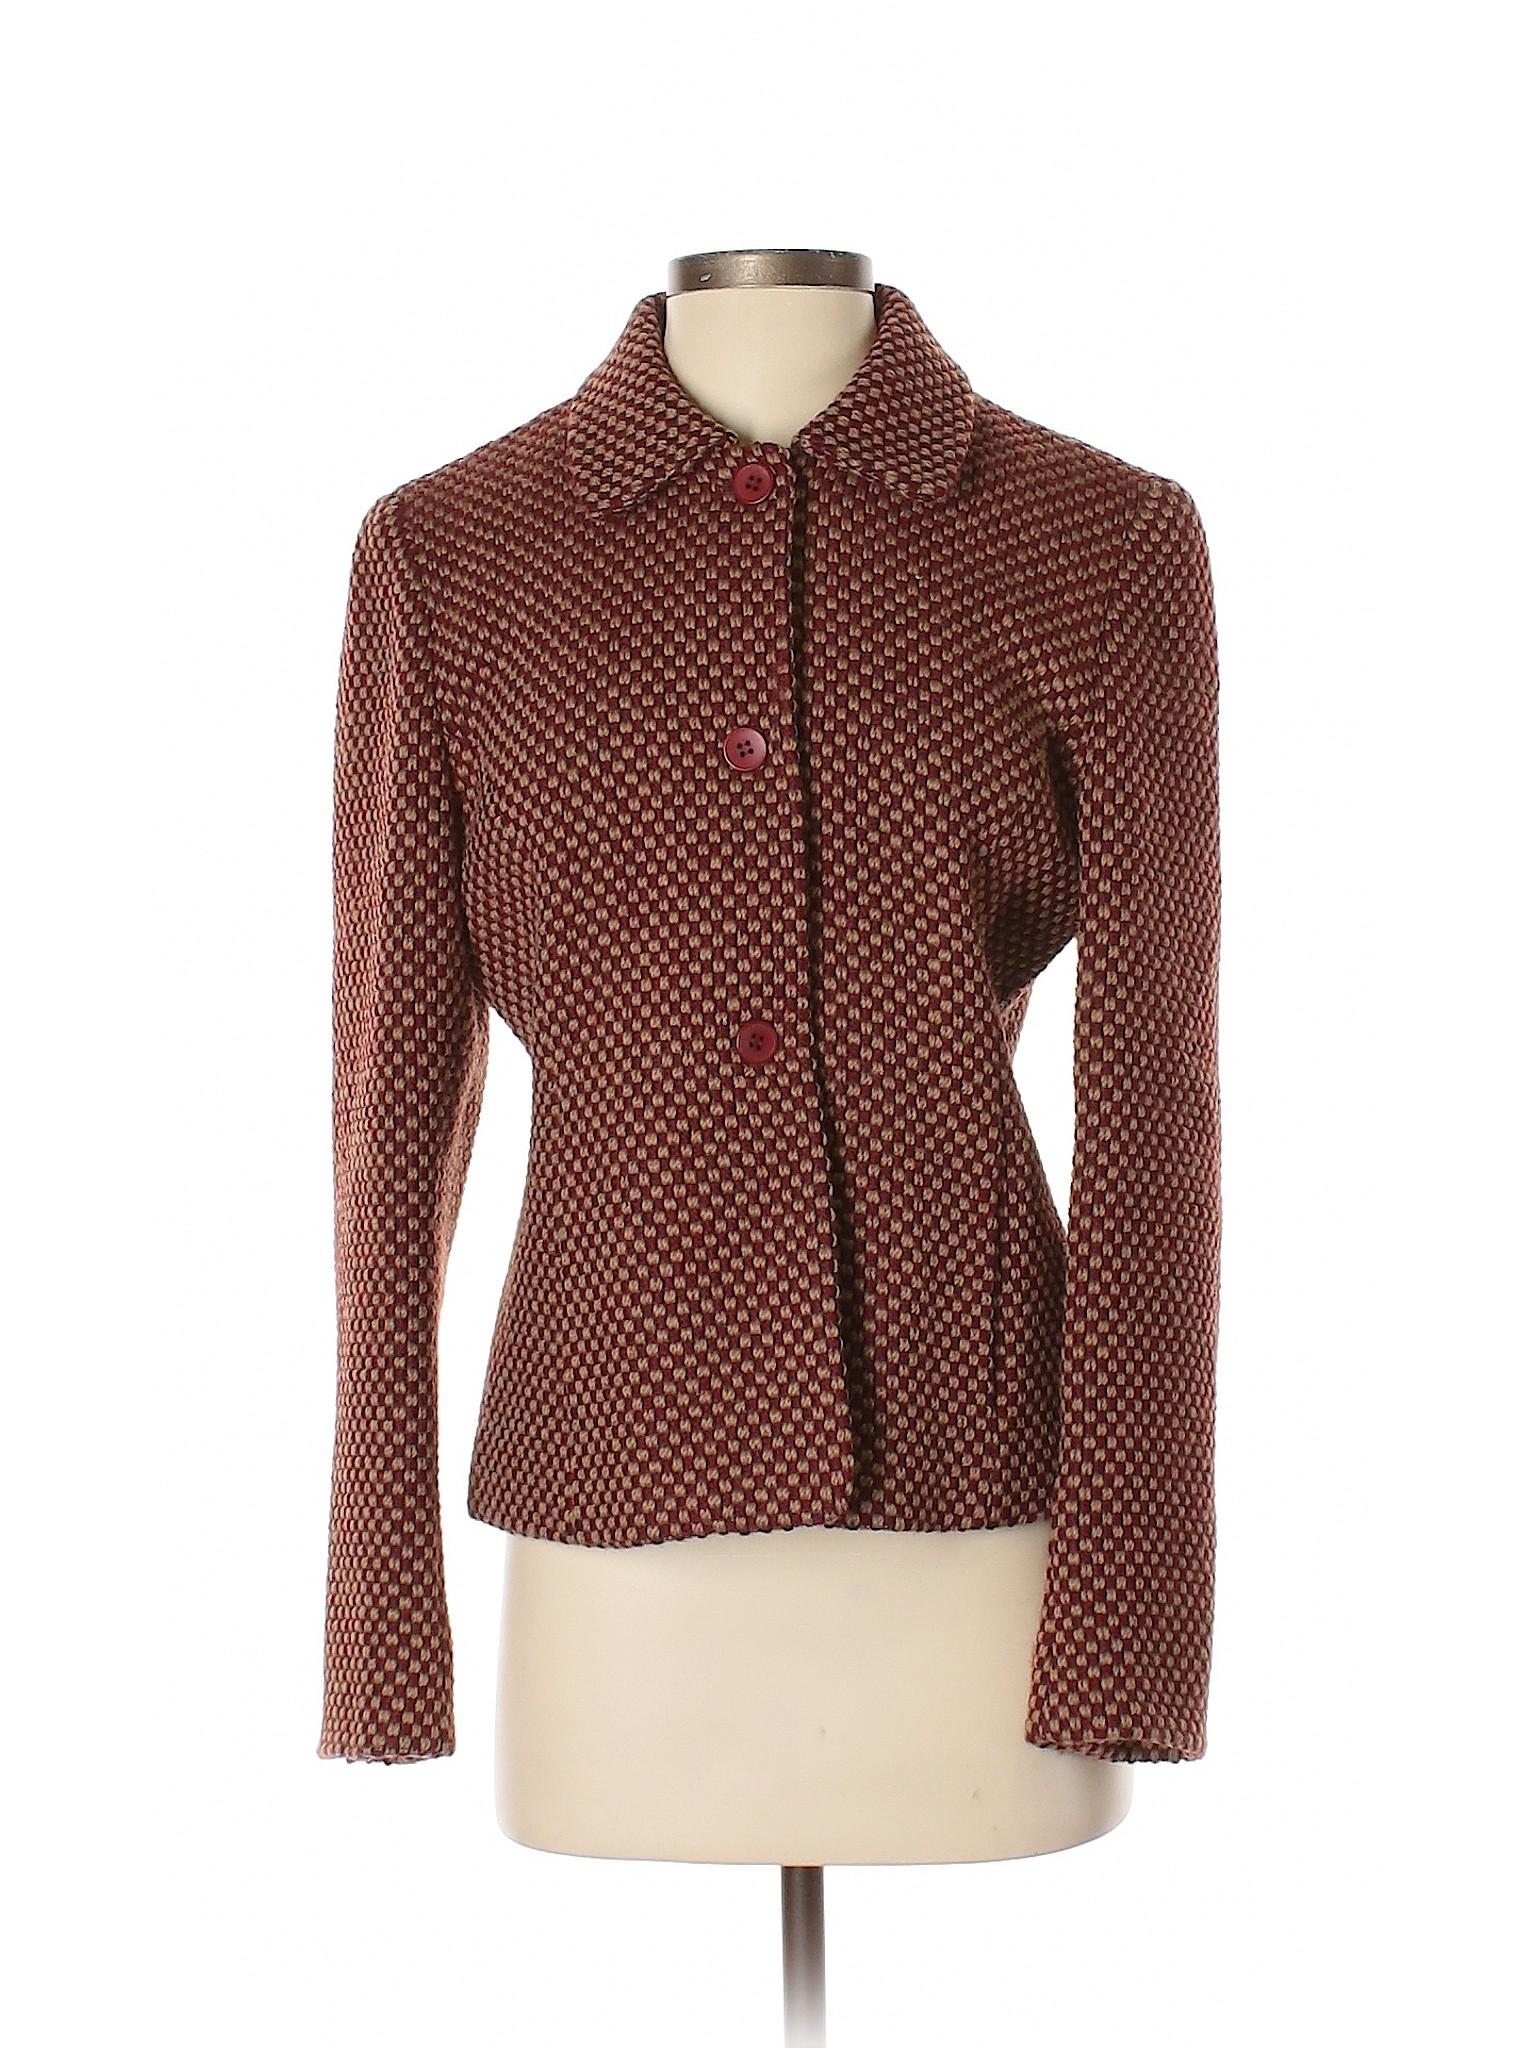 Wool Jones winter New Blazer Boutique York f6I8nPwq